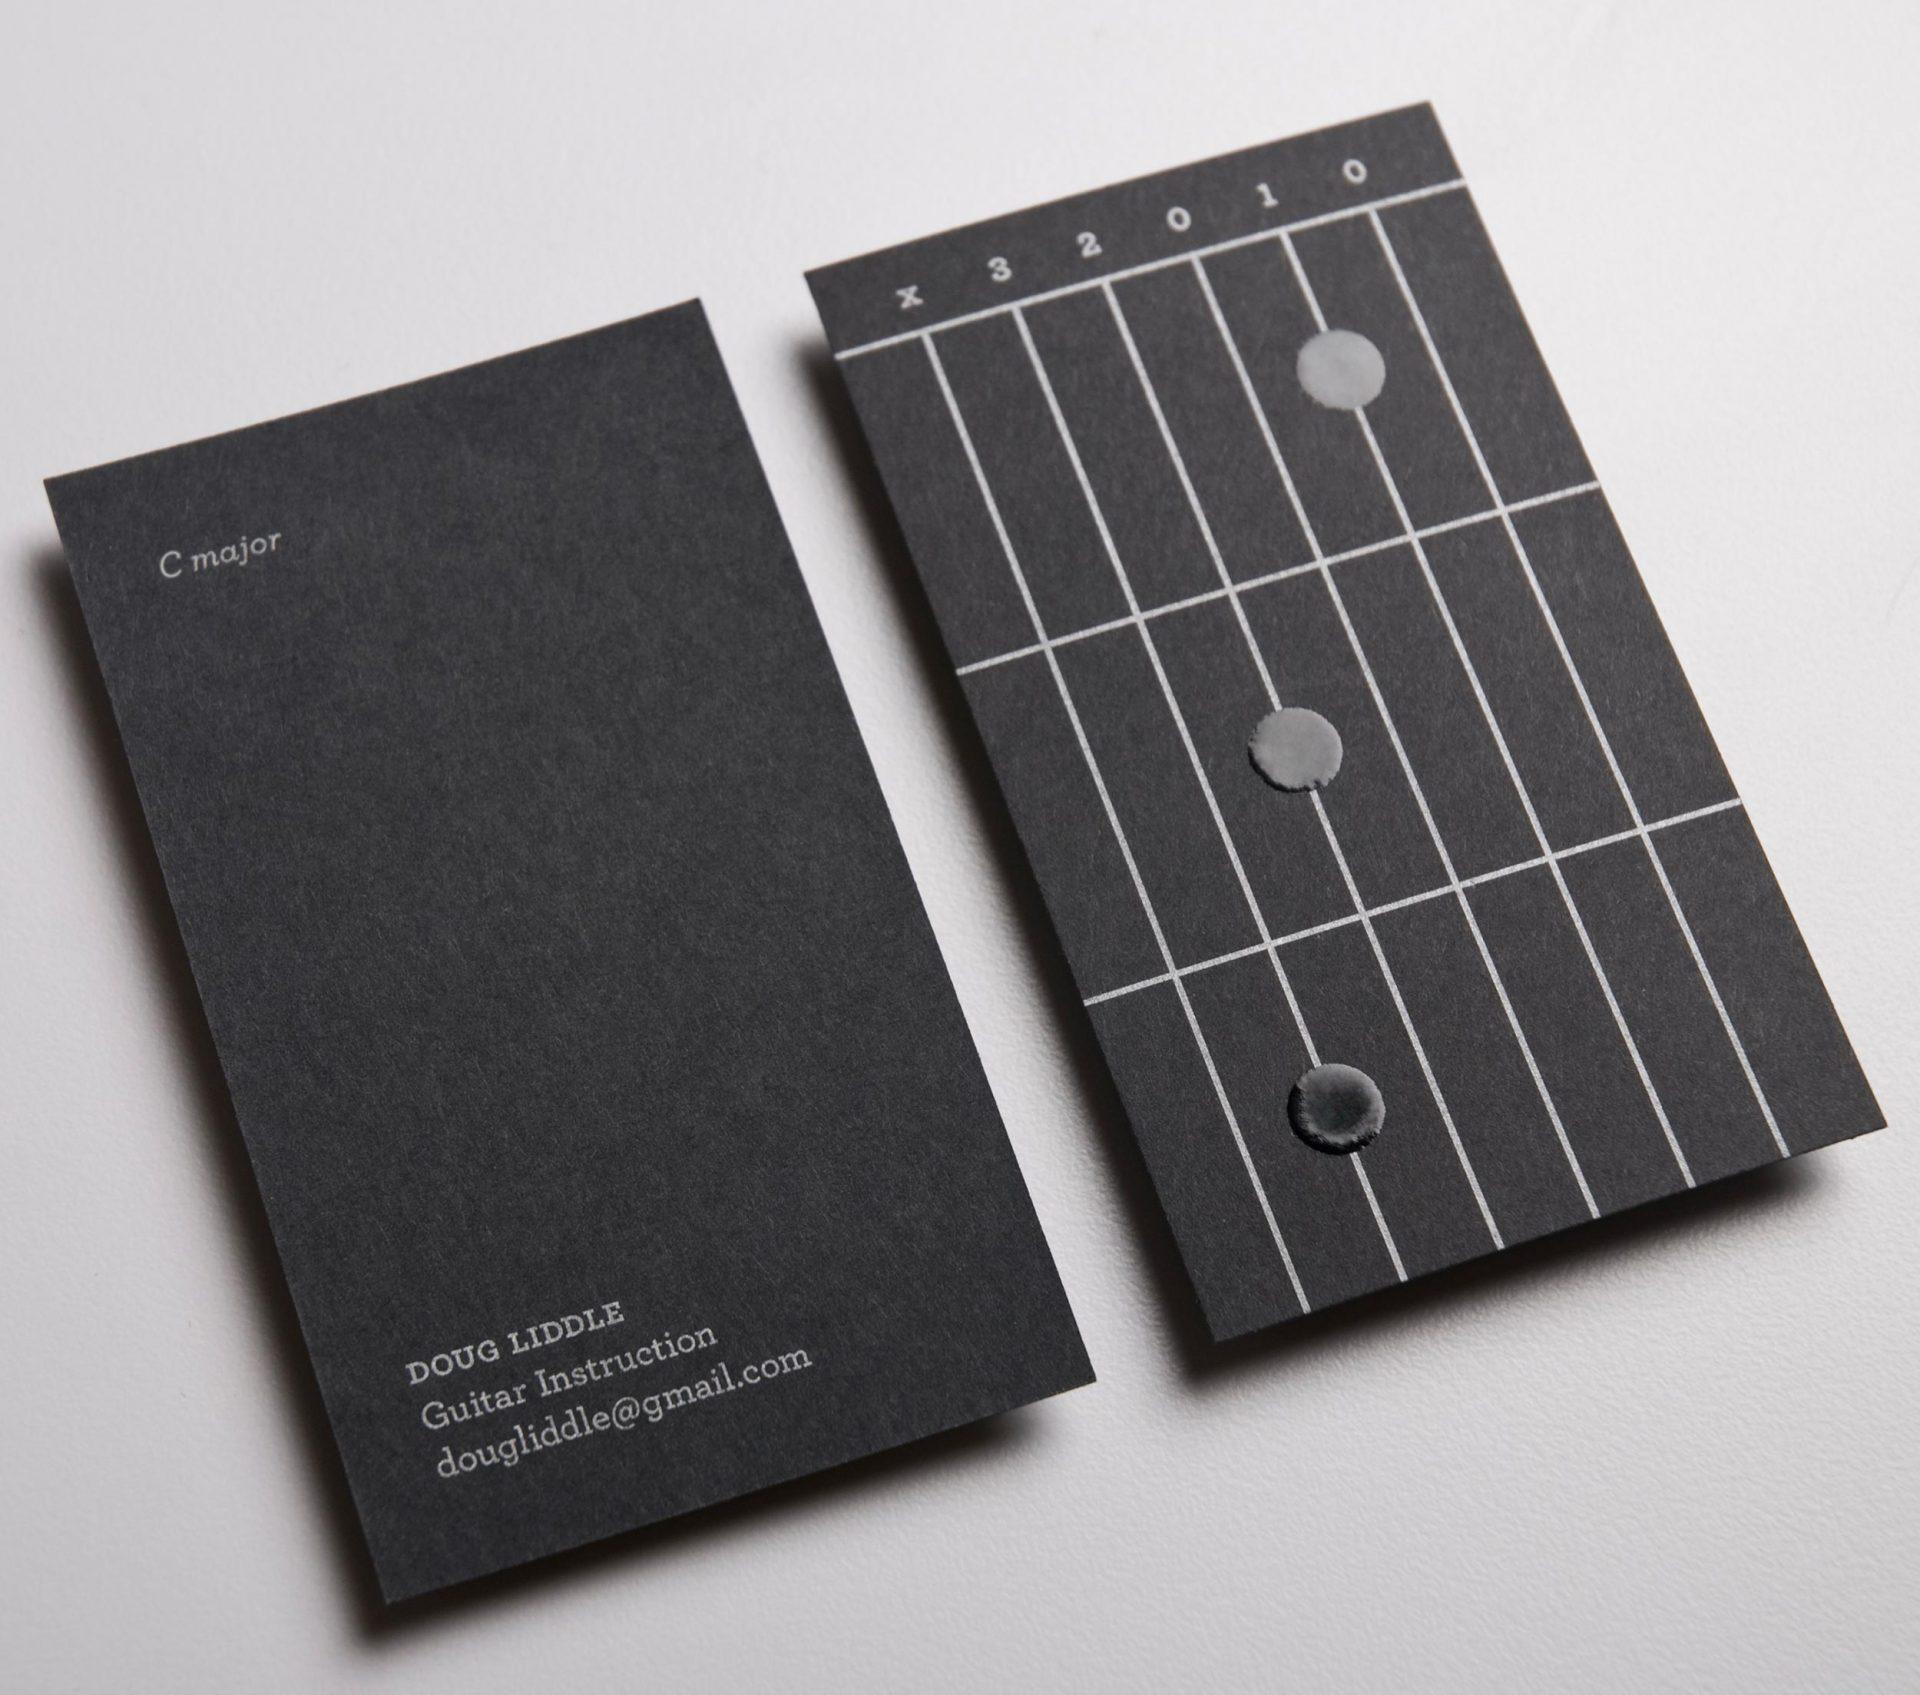 La carte de visite de ce prof de guitare permet d'apprendre les accords